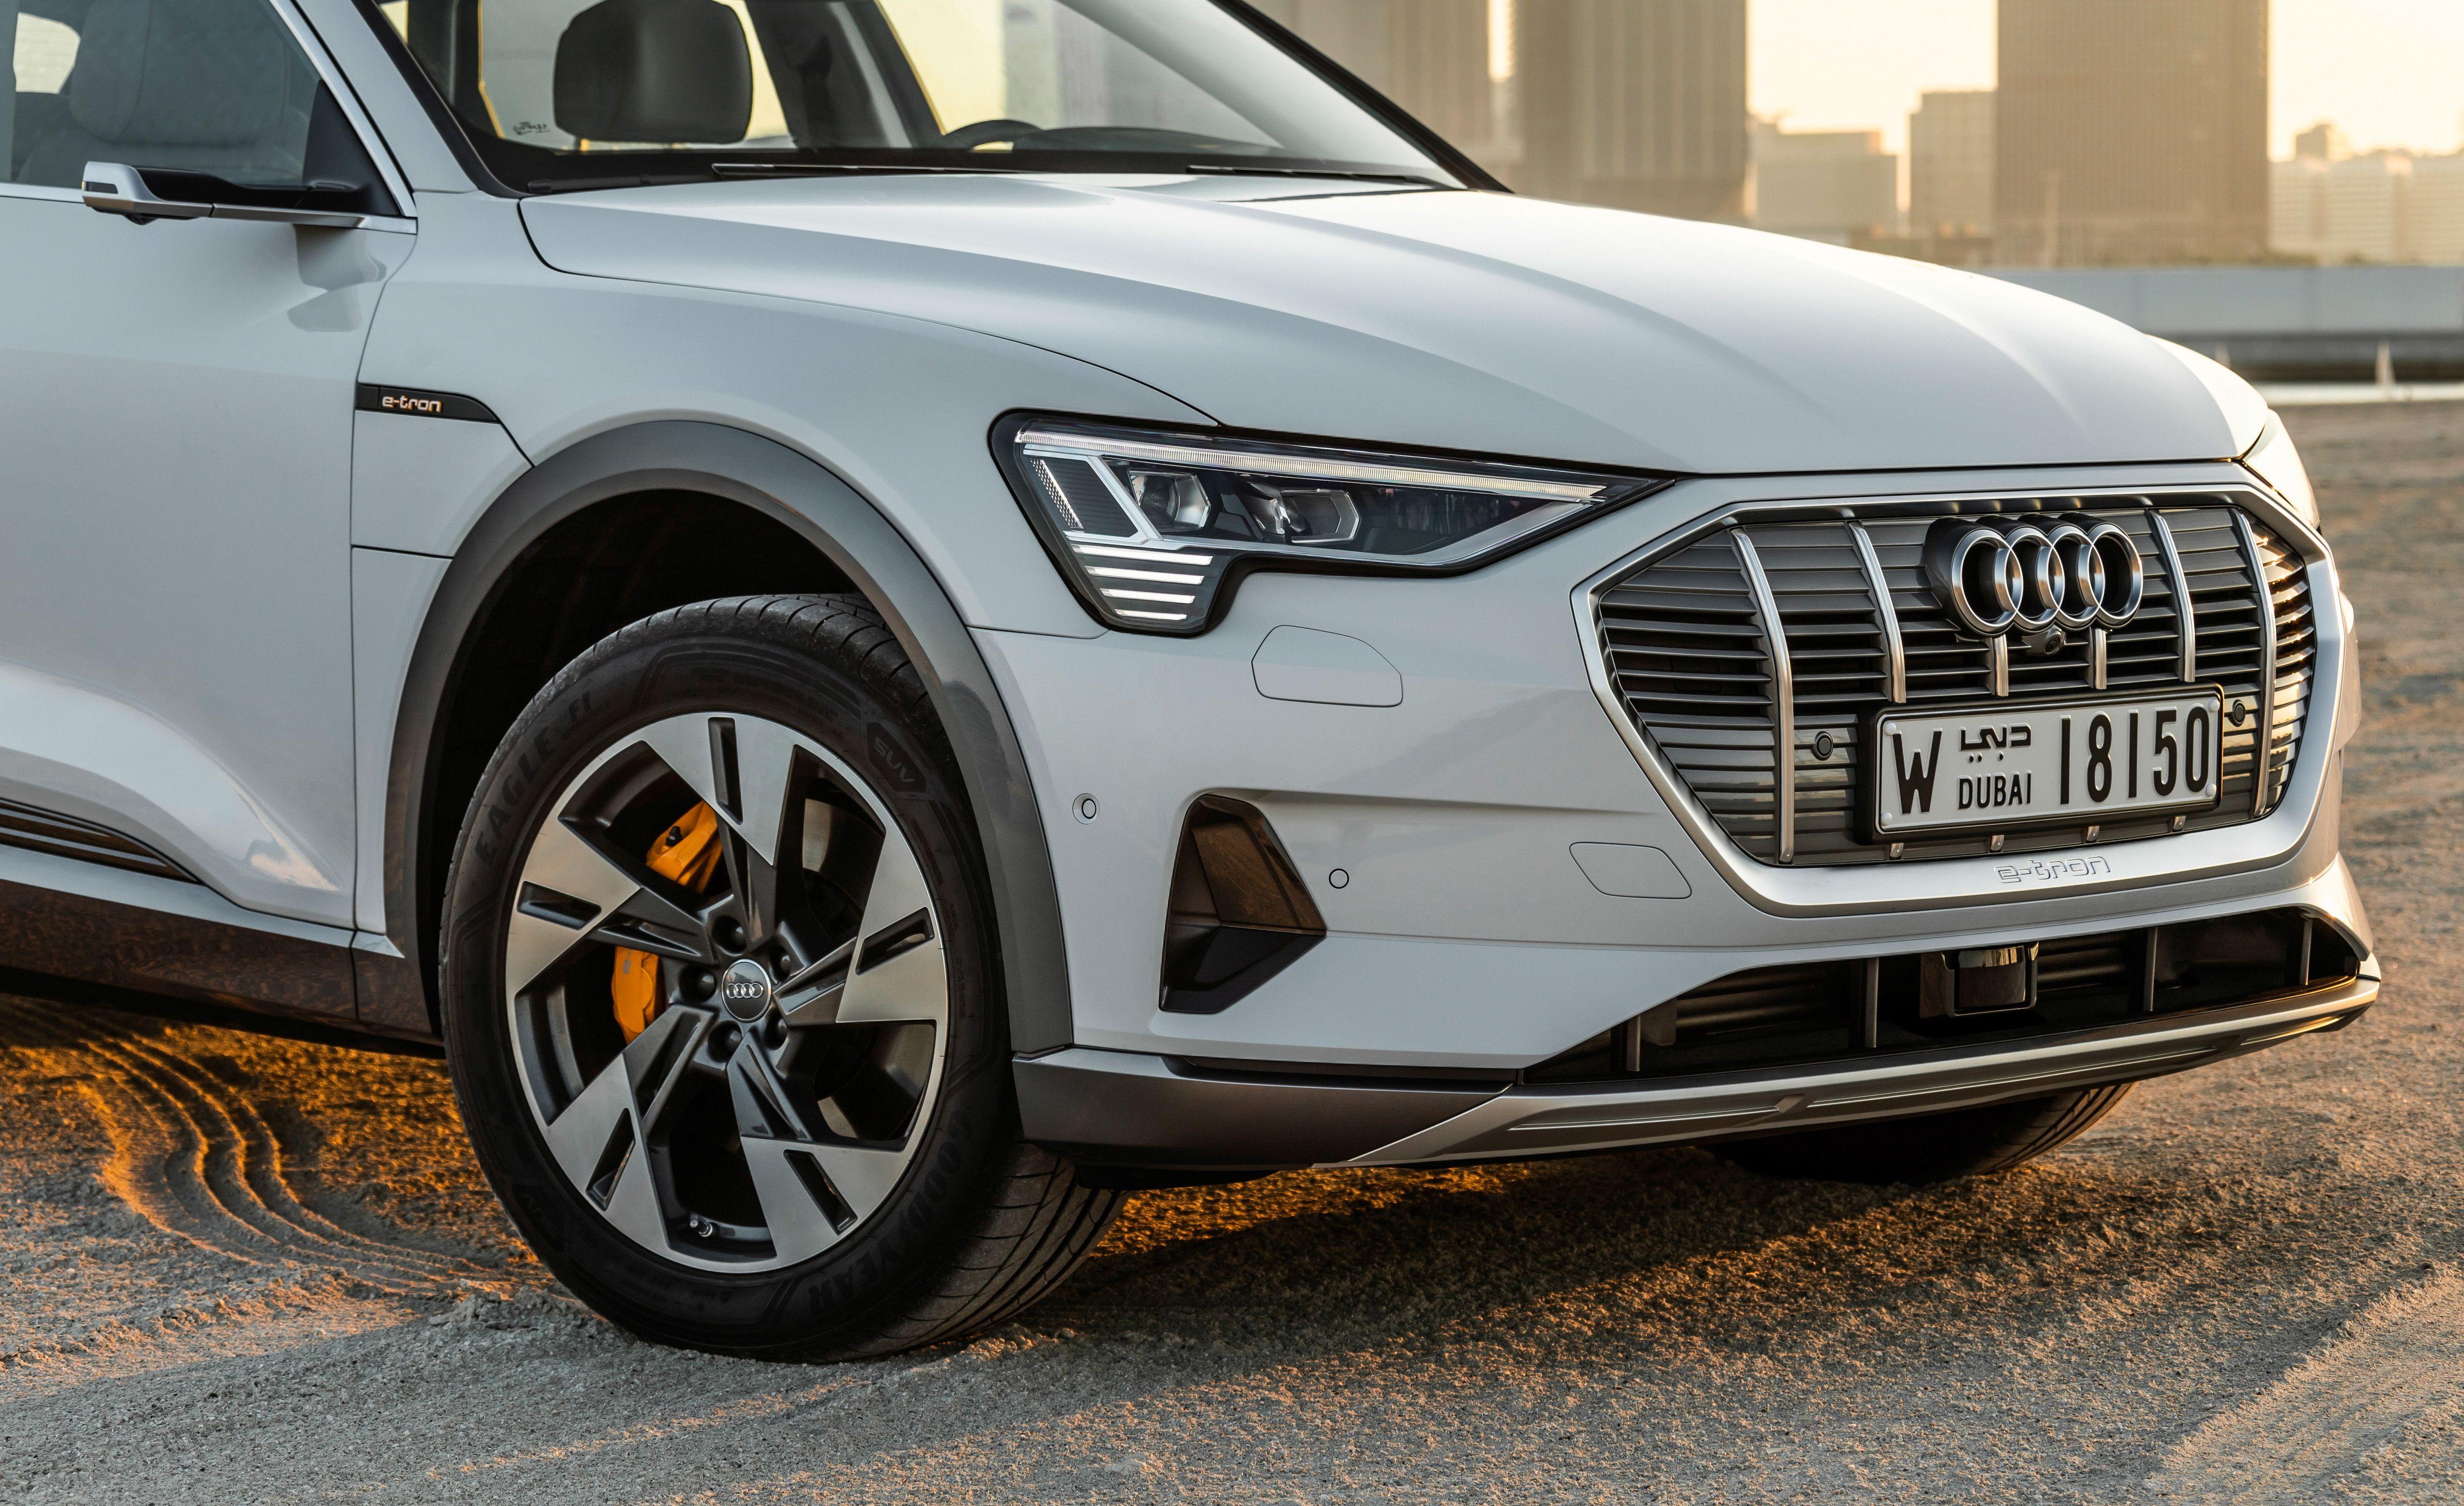 2020 Audi E Tron Reviews Audi E Tron Price Photos And Specs